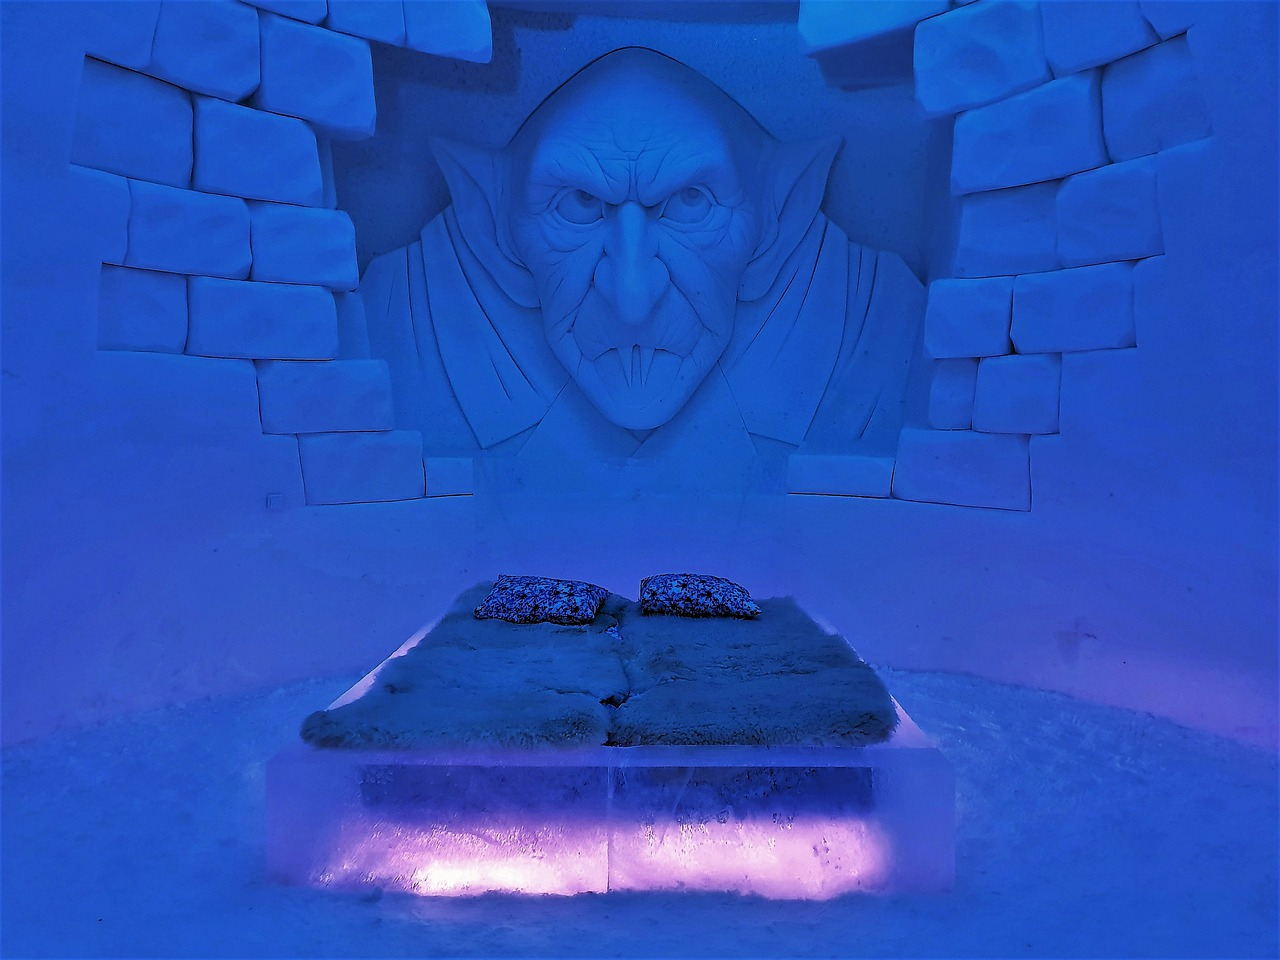 room made of ice